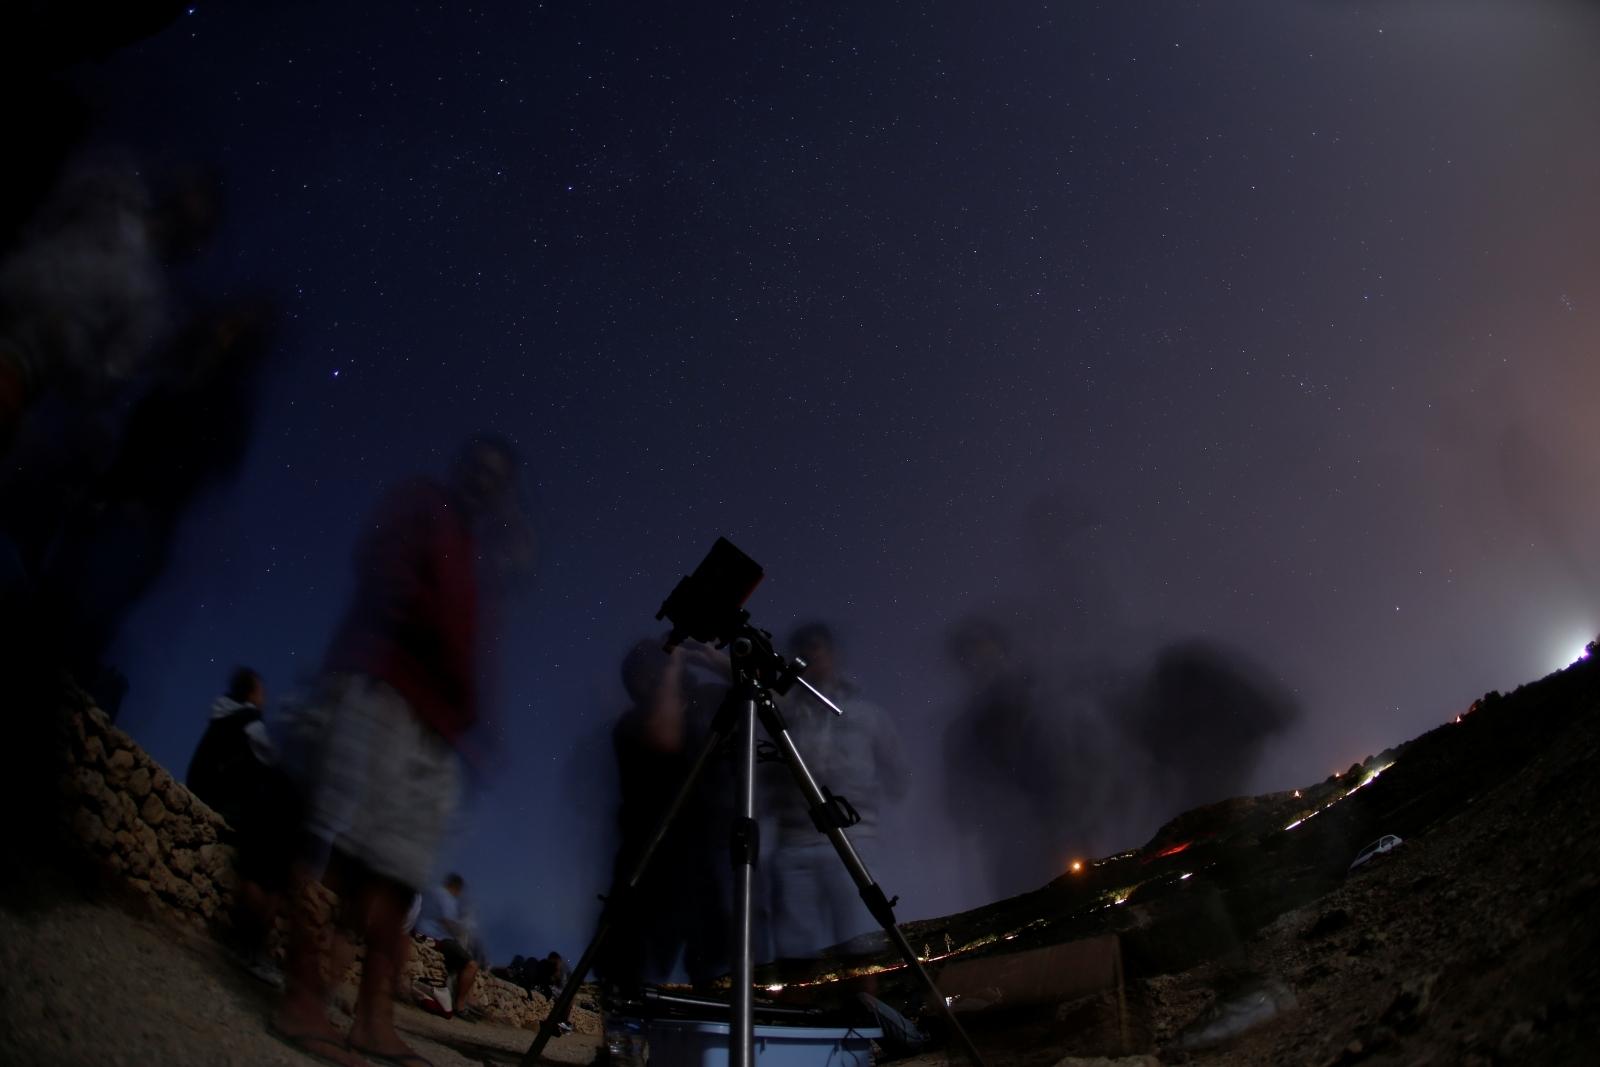 Perseids meteor shower 2017